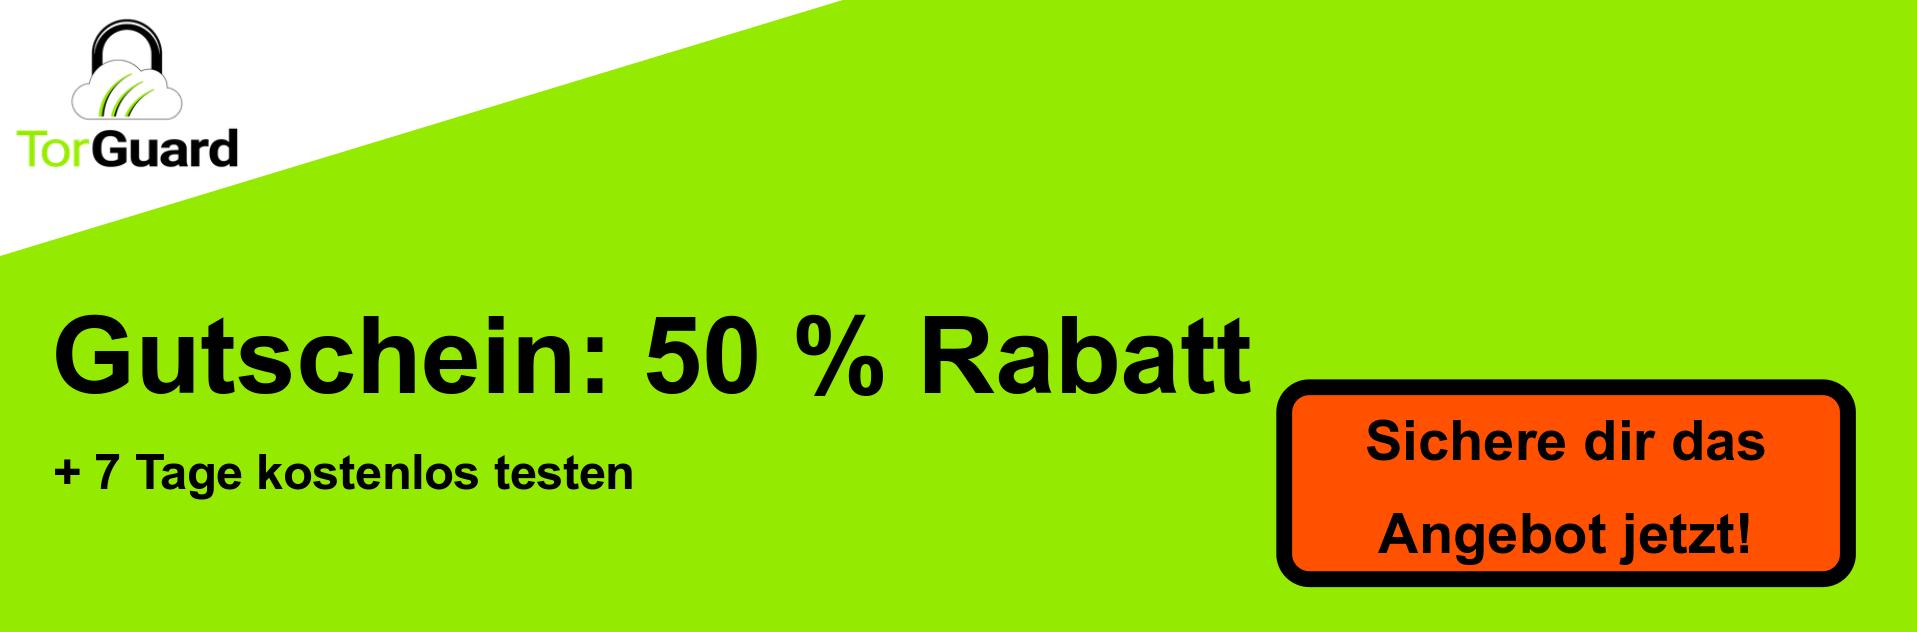 TorGuard VPN Coupon Banner - 50% Rabatt